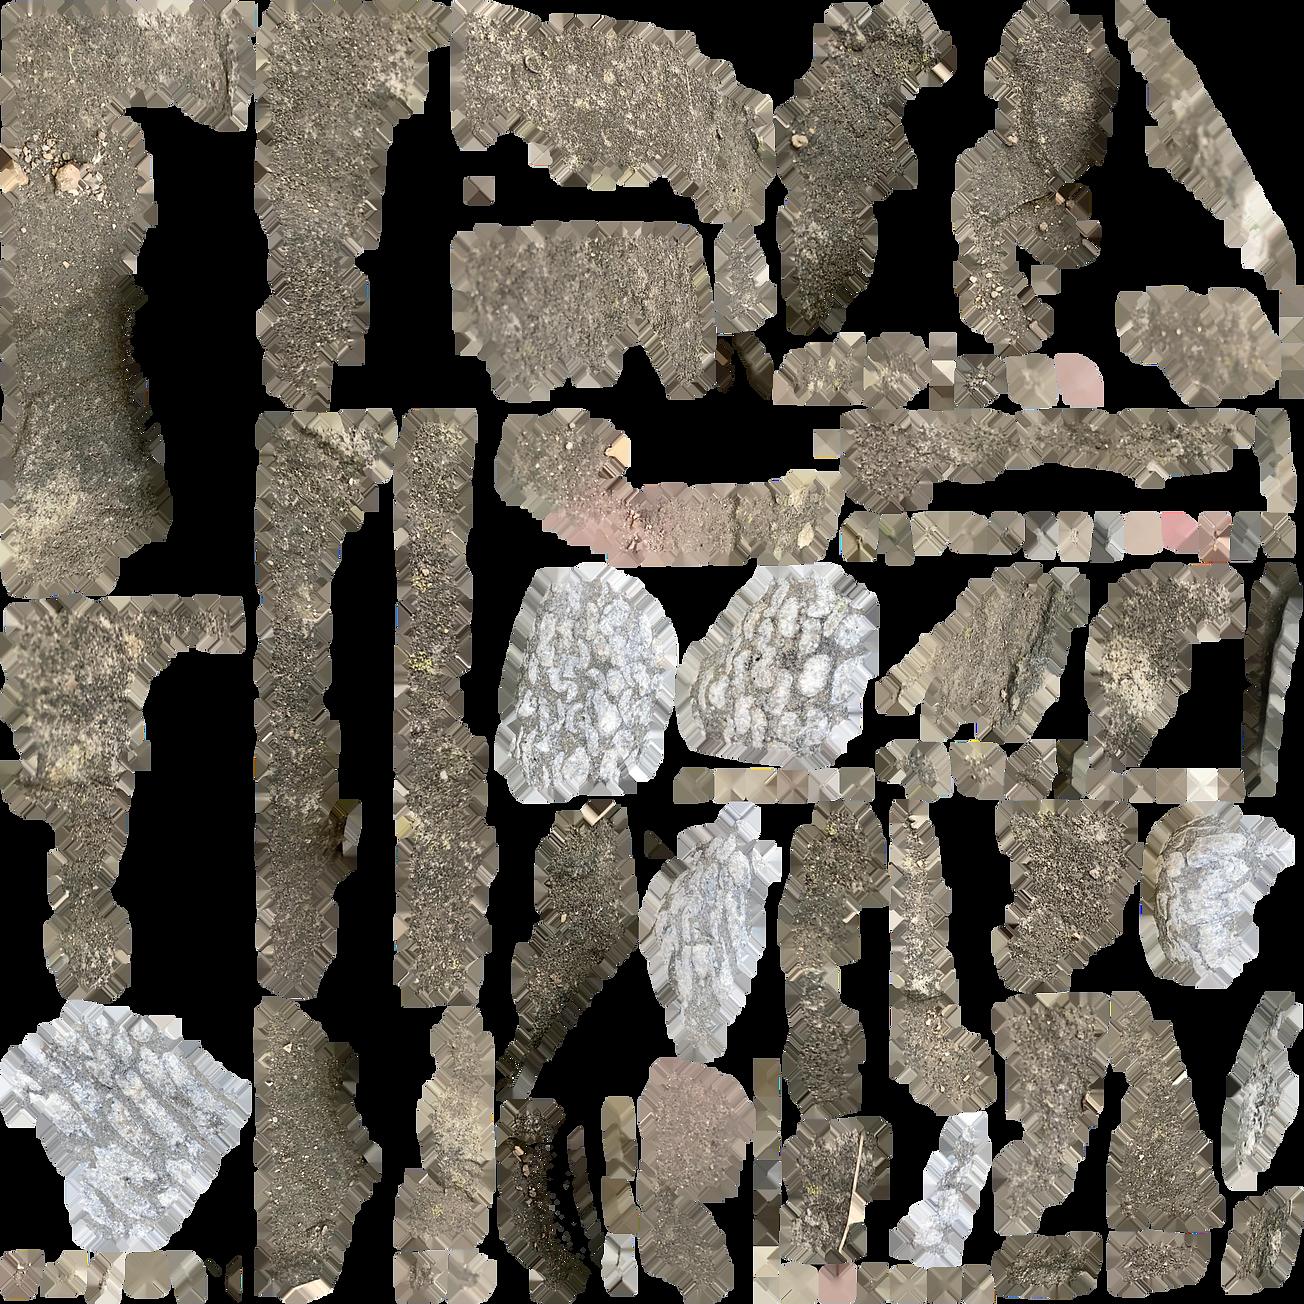 texture9_transp.png